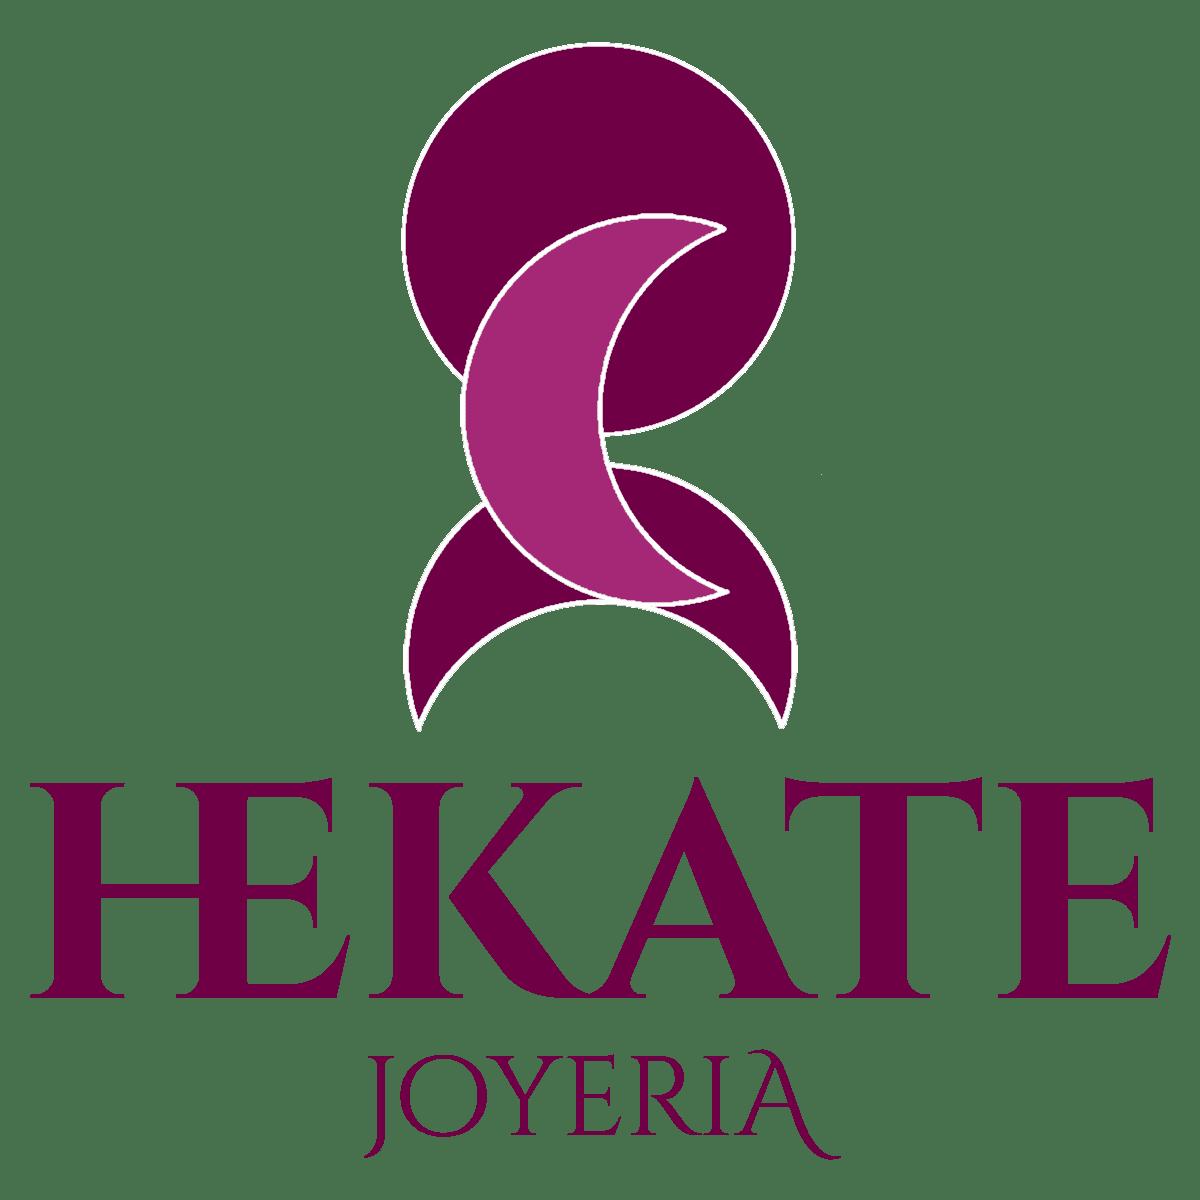 (c) Hekate.com.mx